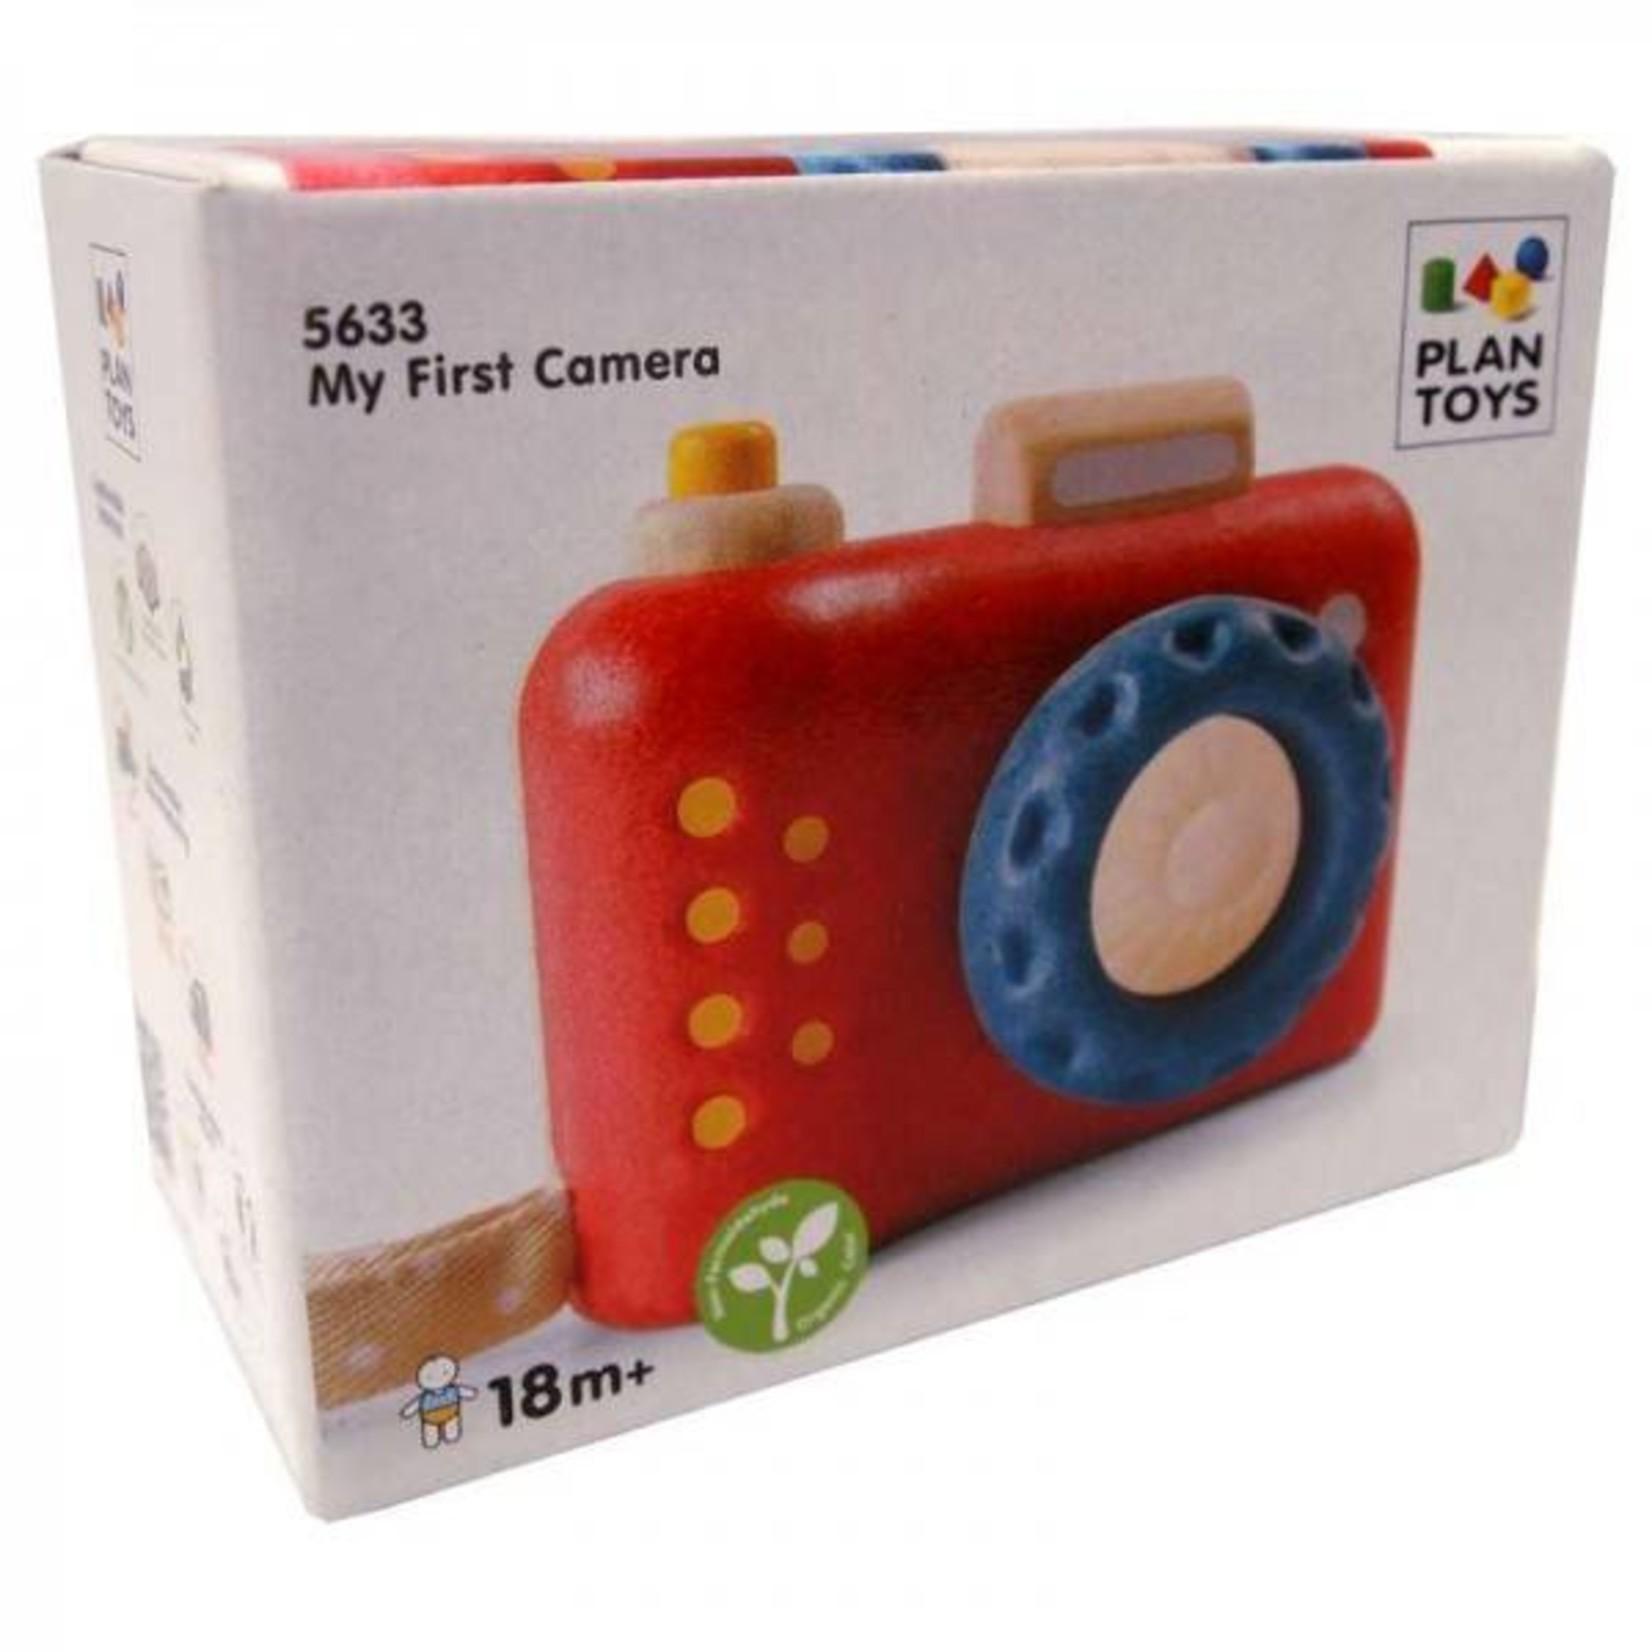 Plan Toys My First Camera